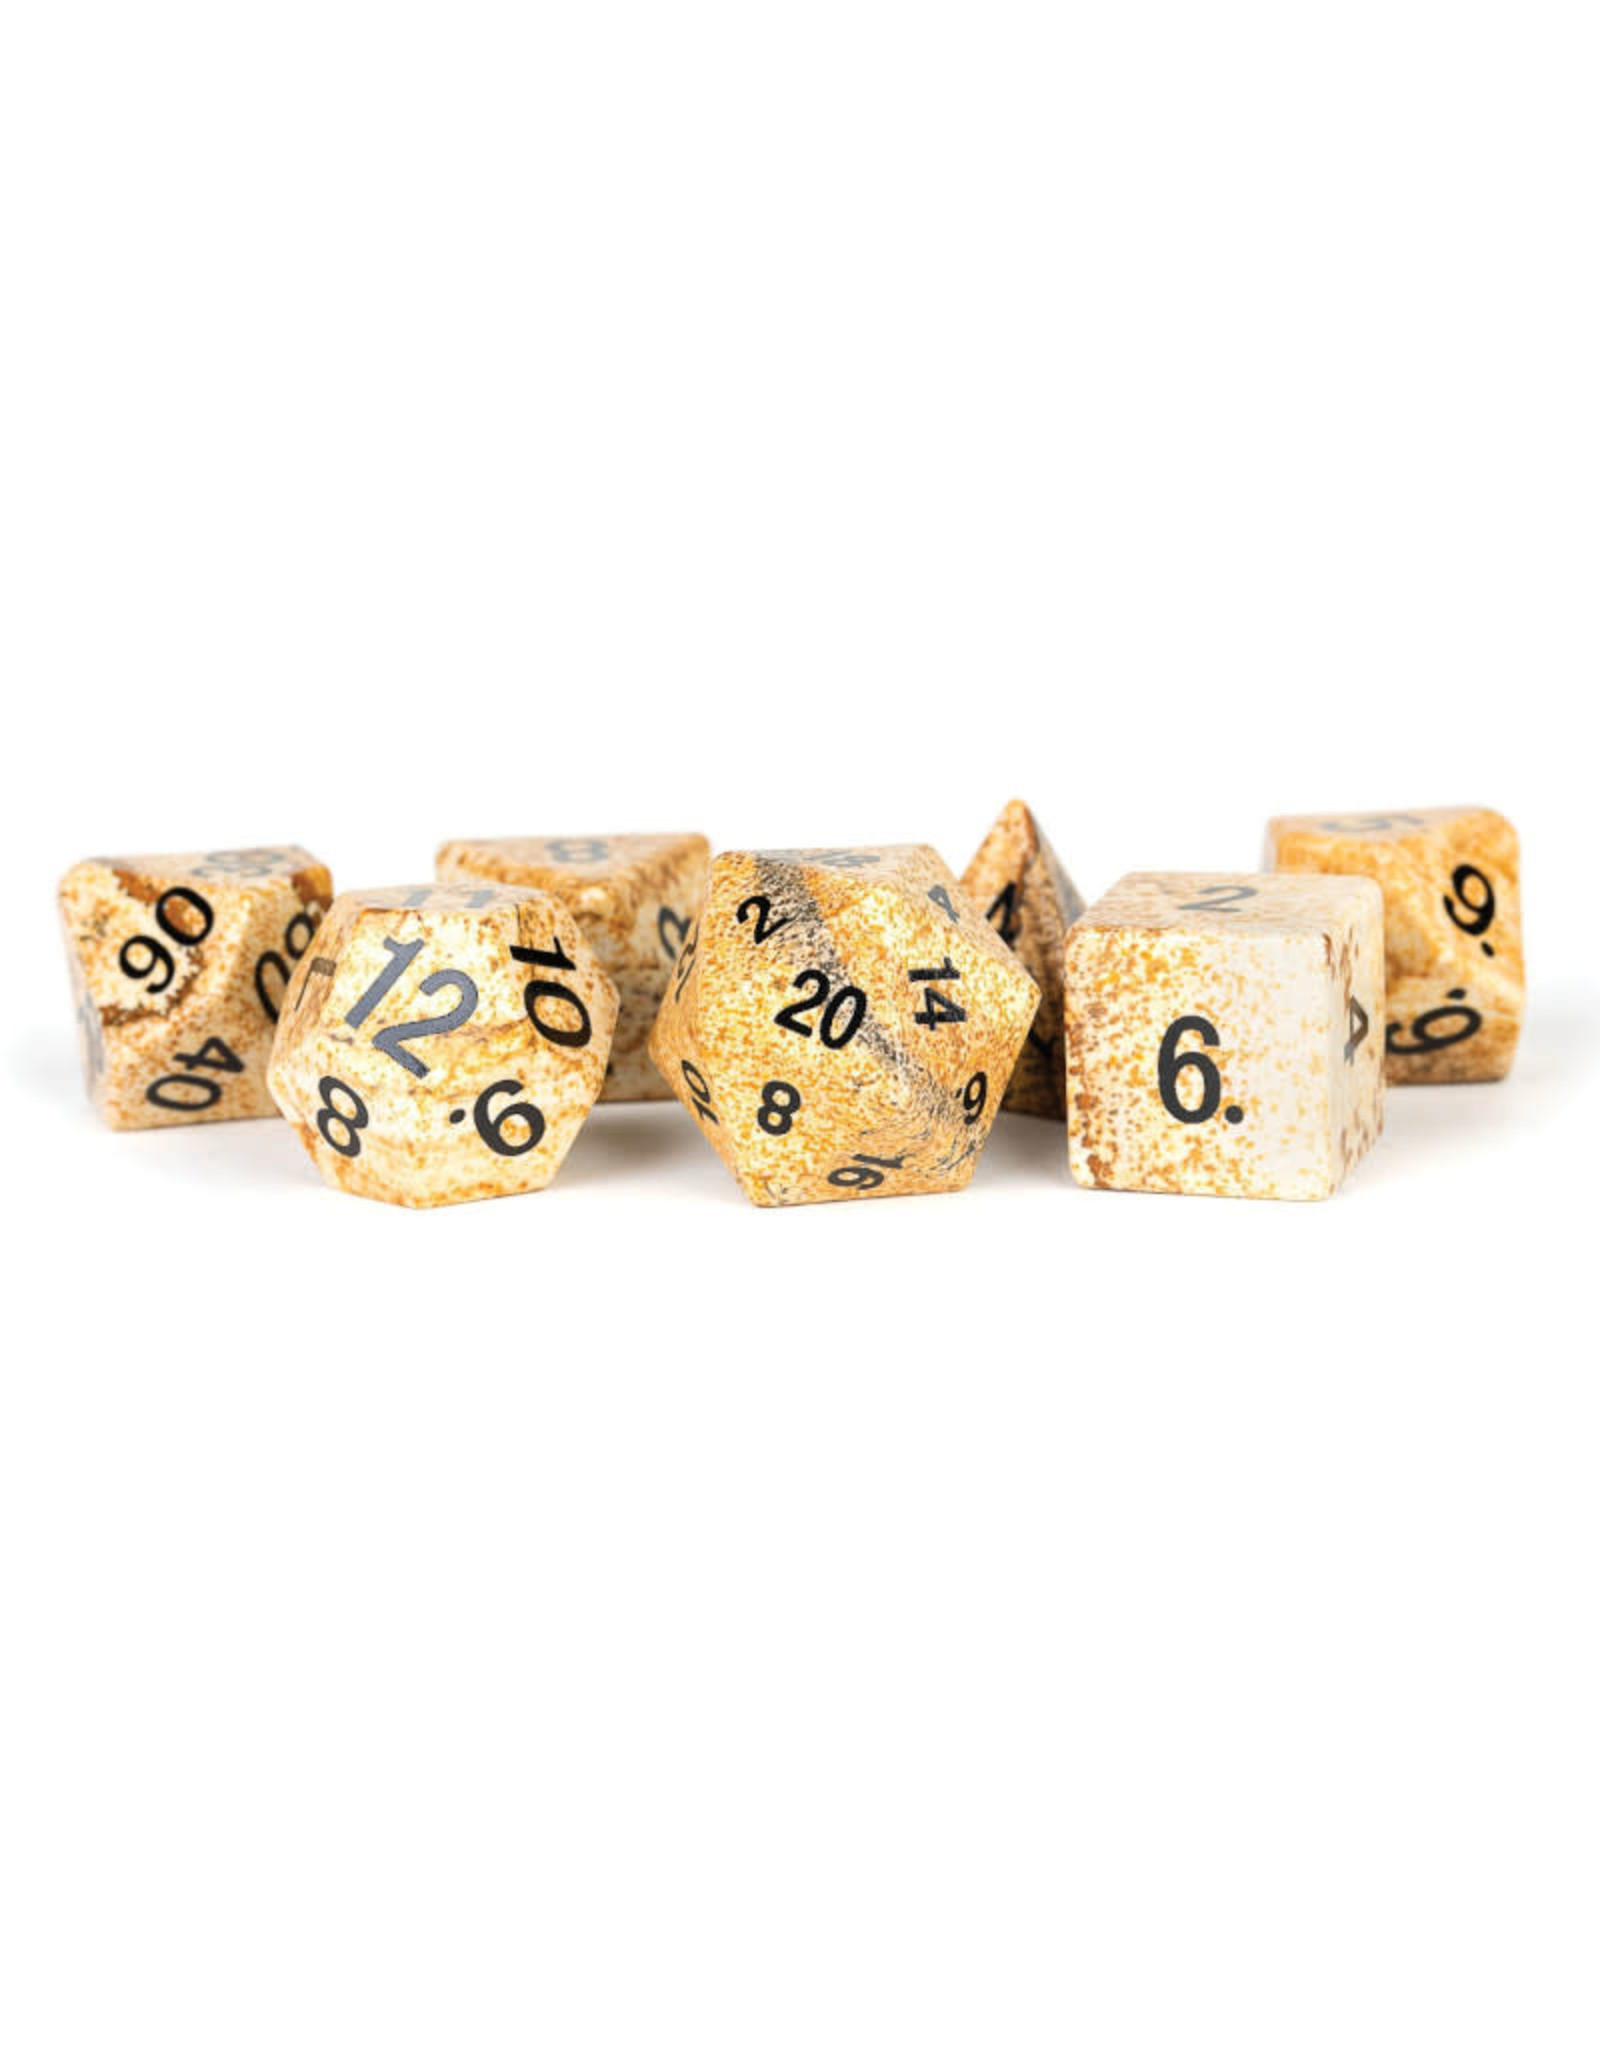 Metallic Dice Games Stone Polyhedral Dice Set: Jasper (7)